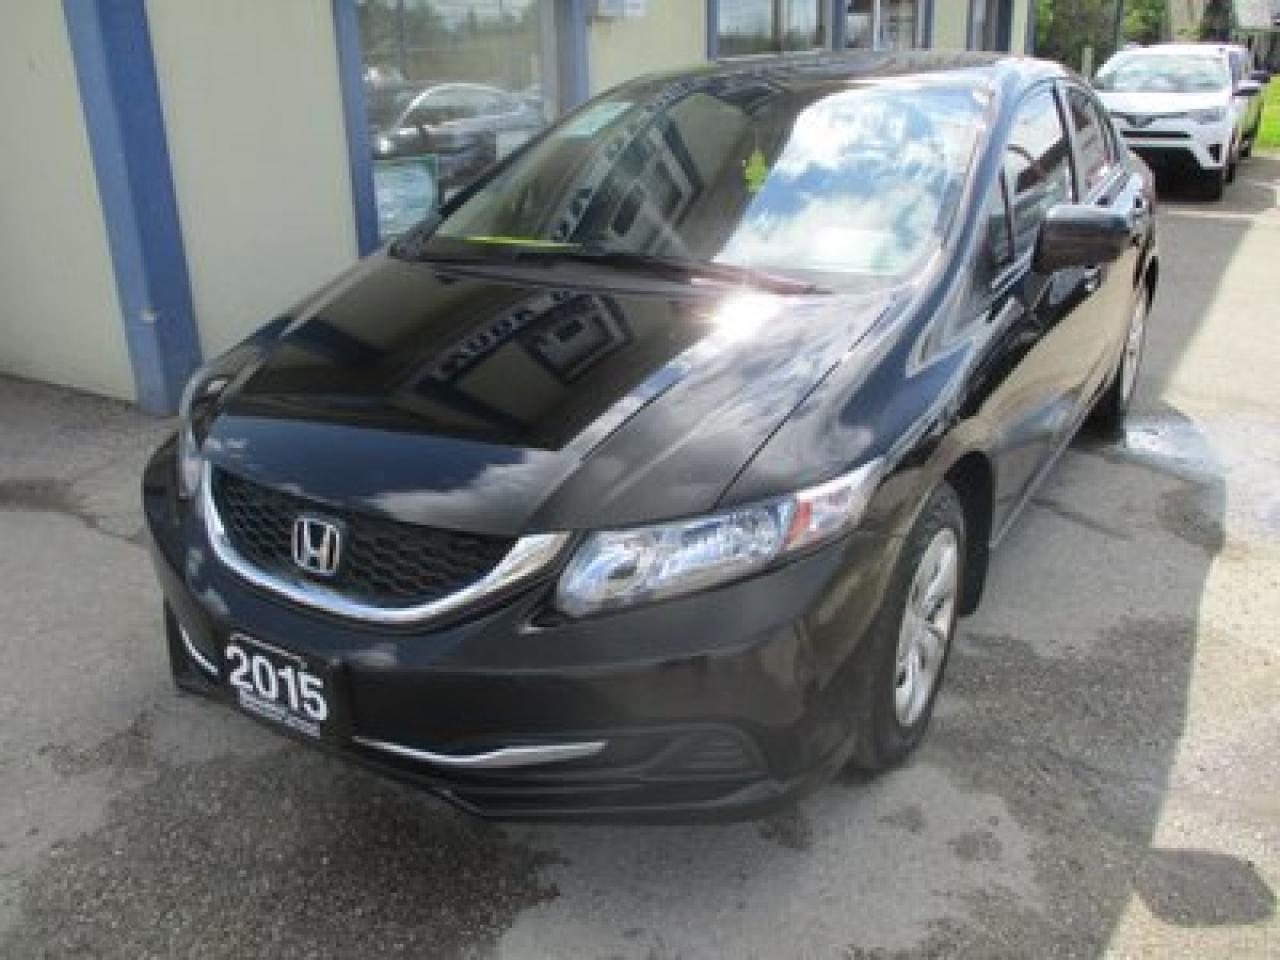 2015 Honda Civic FUEL EFFICIENT LX MODEL 5 PASSENGER 1.8L - SOHC.. HEATED SEATS.. CD/AUX/USB INPUT.. BLUETOOTH.. BACK-UP CAMERA.. KEYLESS ENTRY..